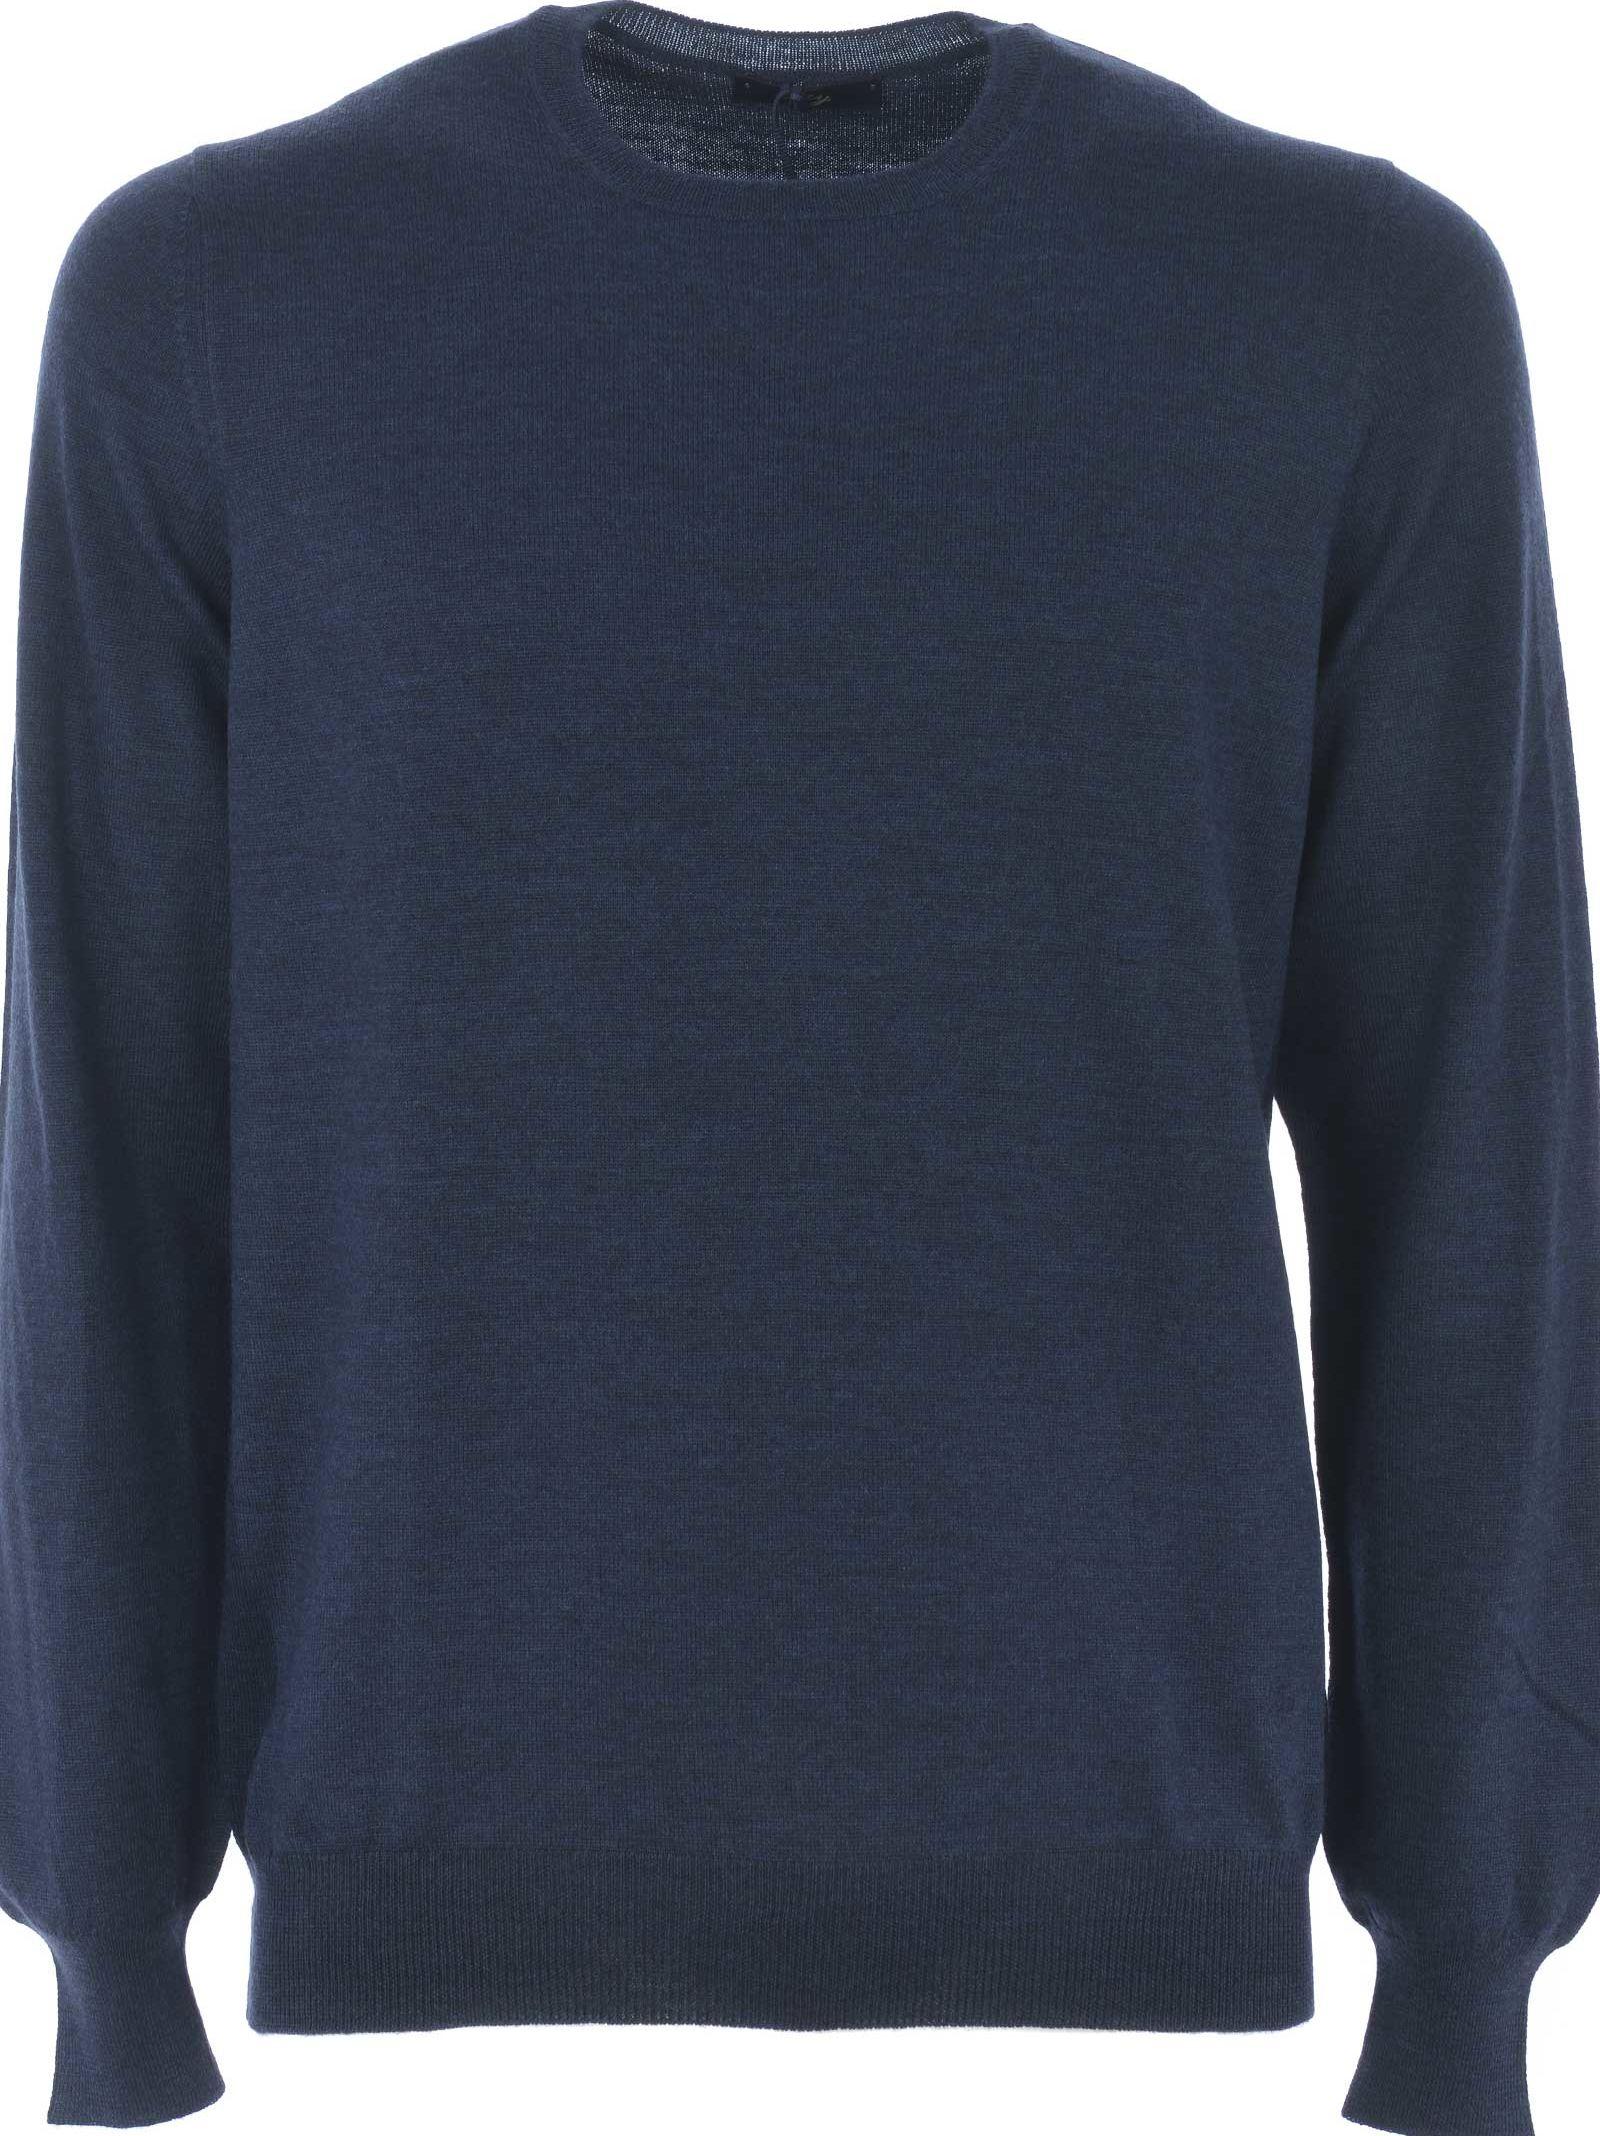 Fay Lightweight Crew Neck Sweater